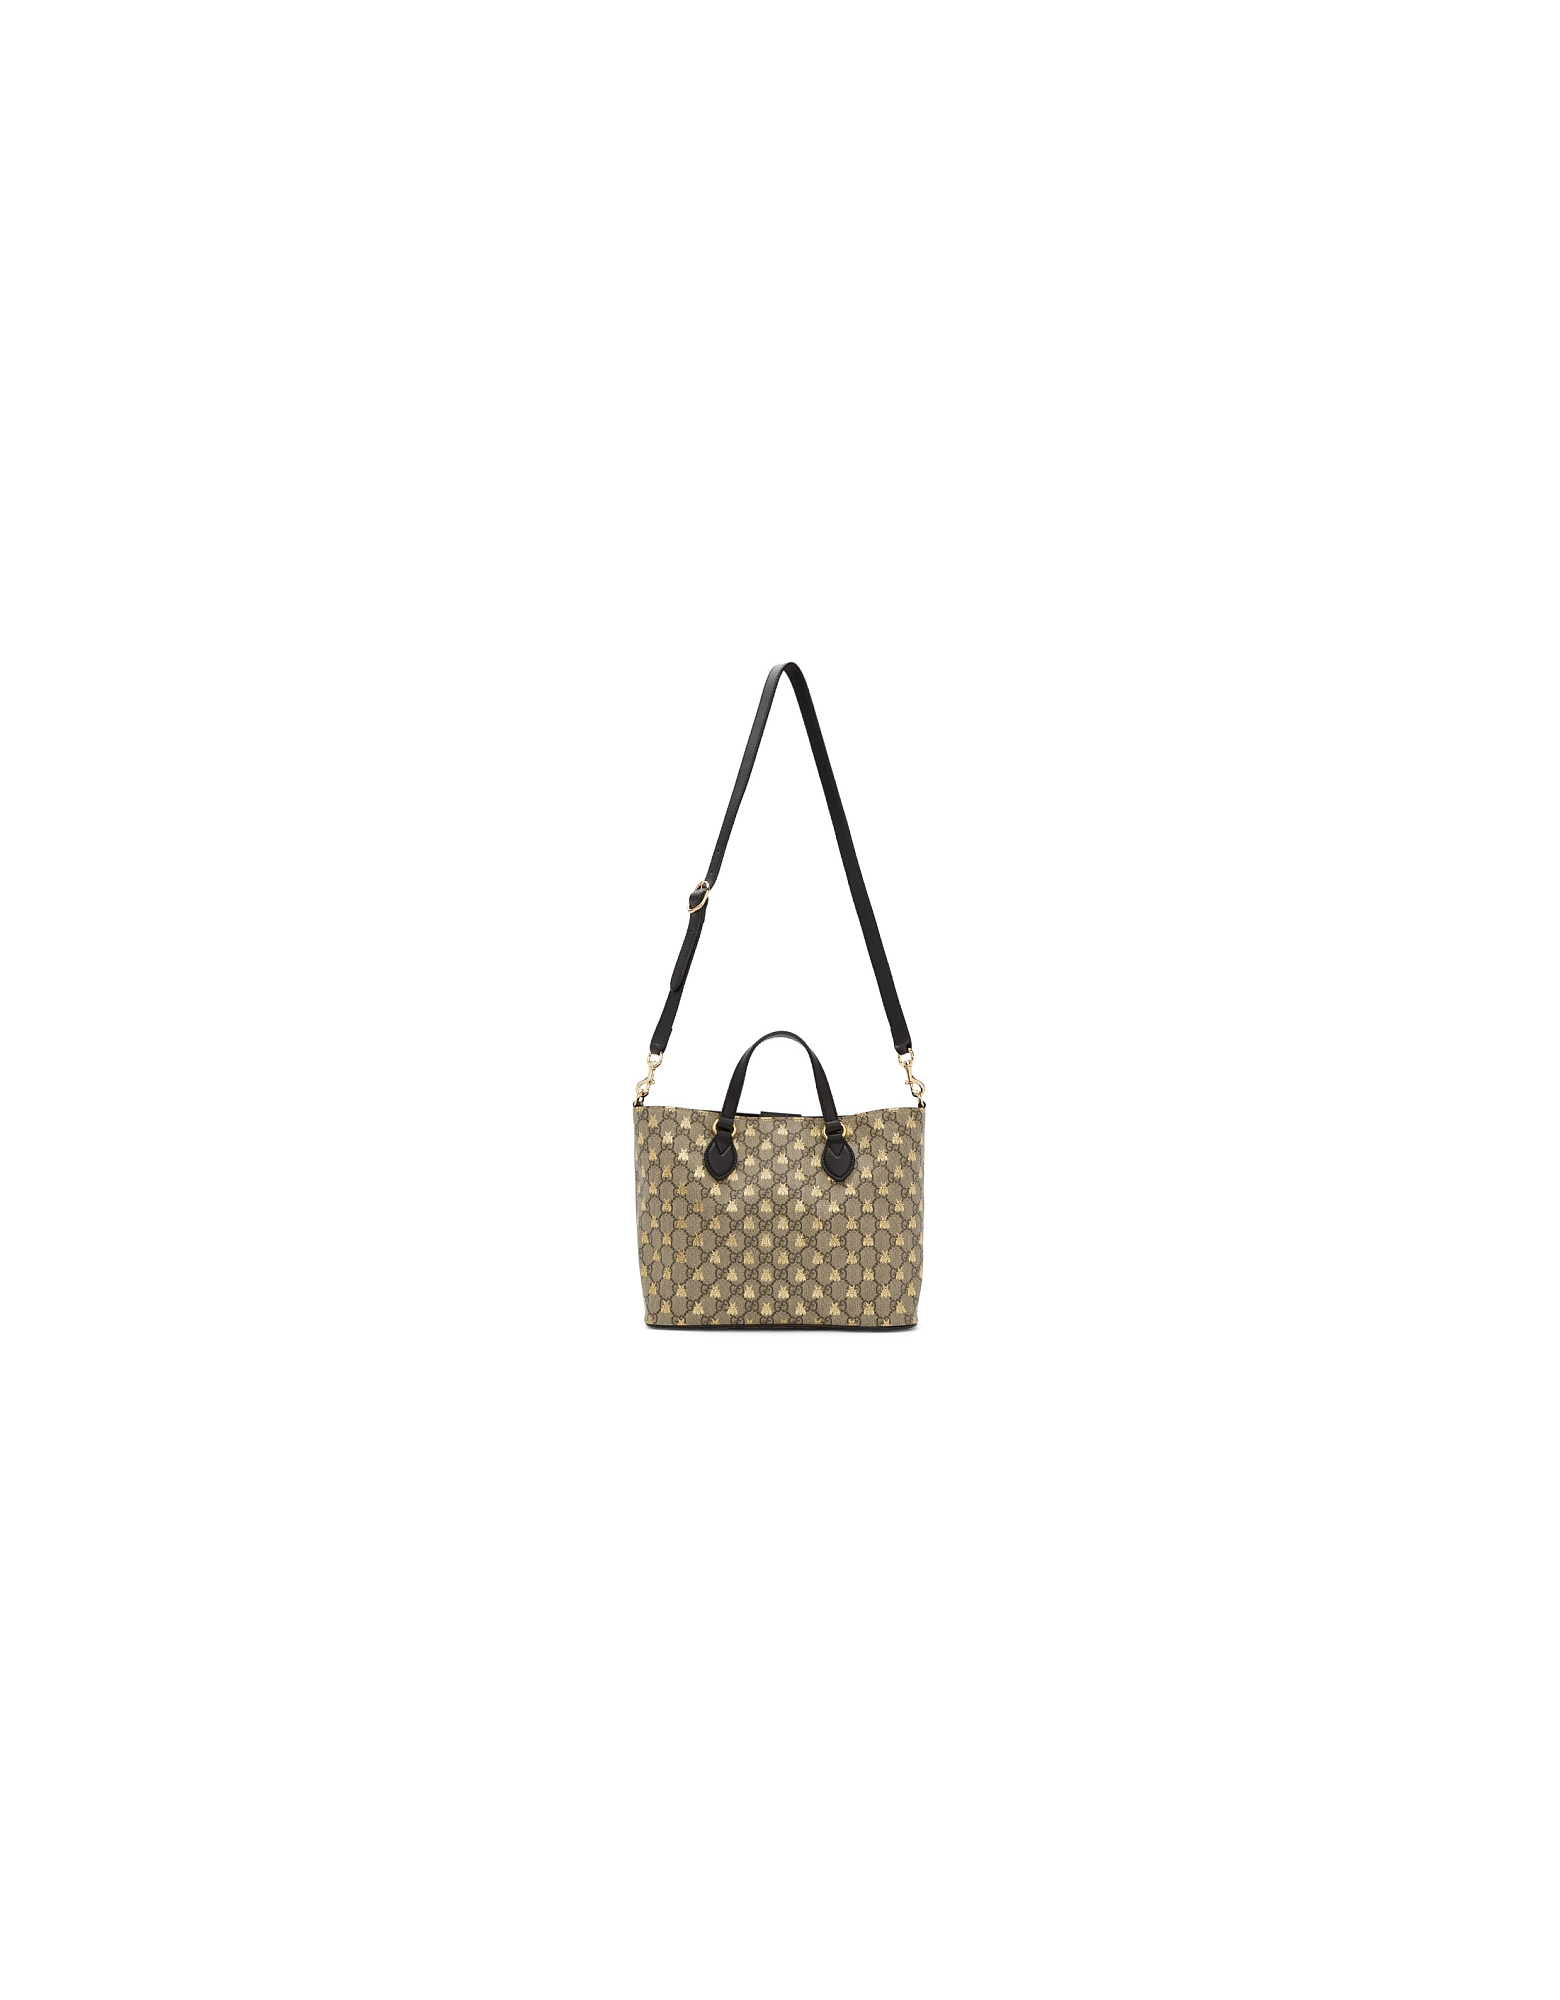 Gucci Designer Handbags, Beige GG Supreme Bestiary Tote